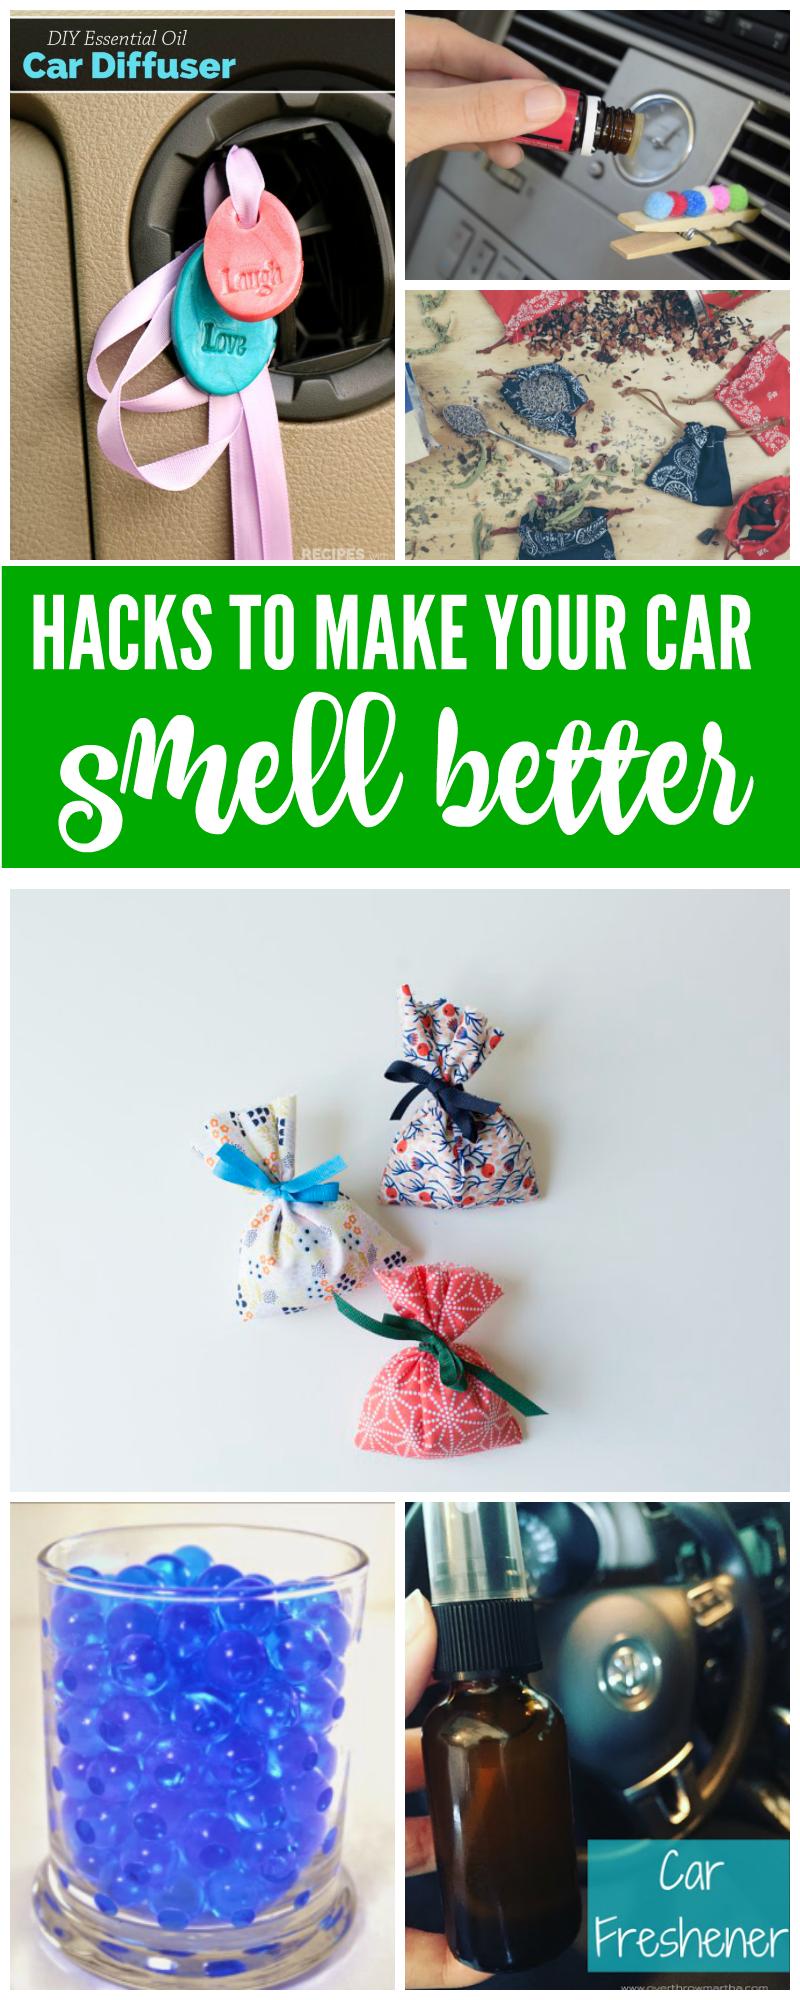 15 ways to make your car smell better. Black Bedroom Furniture Sets. Home Design Ideas